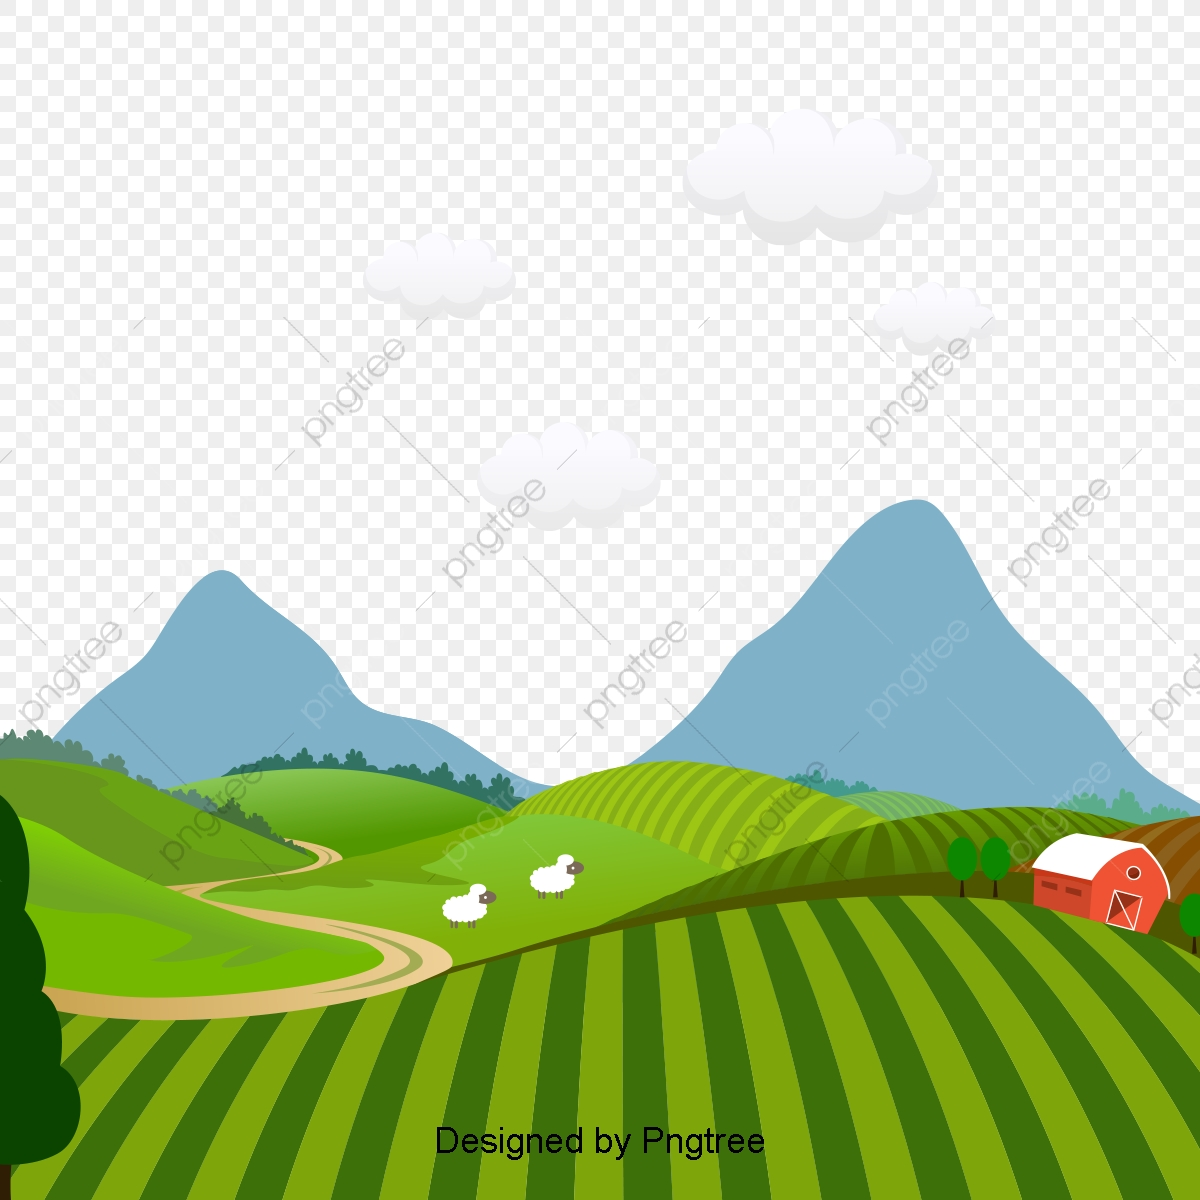 Kartun Indah Tangan Dicat Desa Pemandangan, Estetika, Kartun.